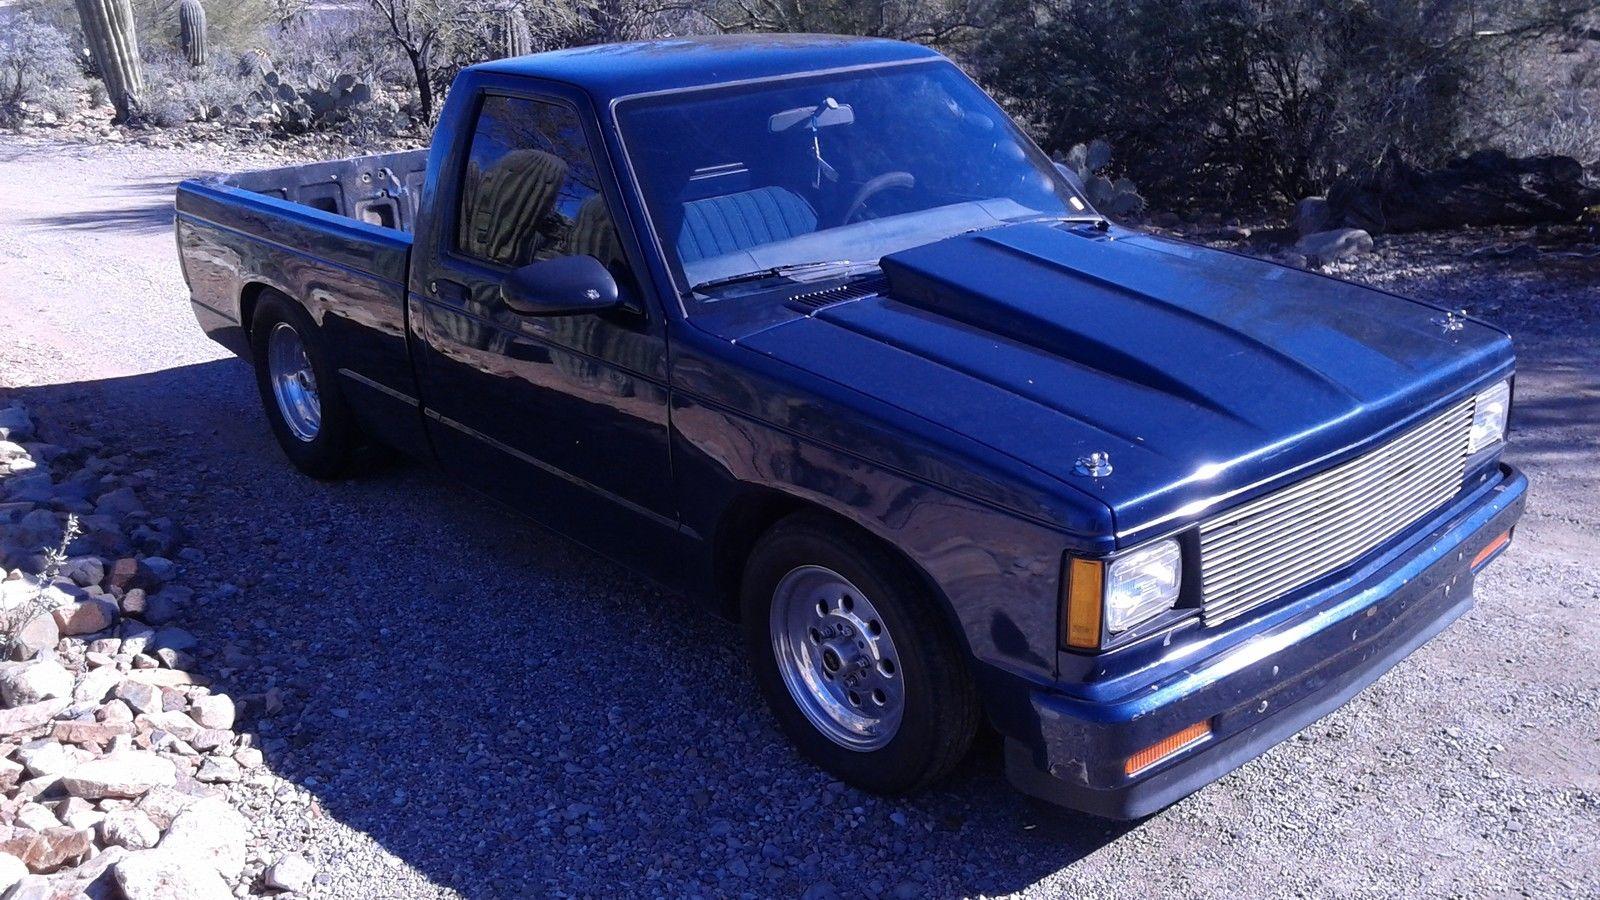 1985 chevrolet s10 v8 for sale in tucson arizona united for Chevy v8 motors for sale